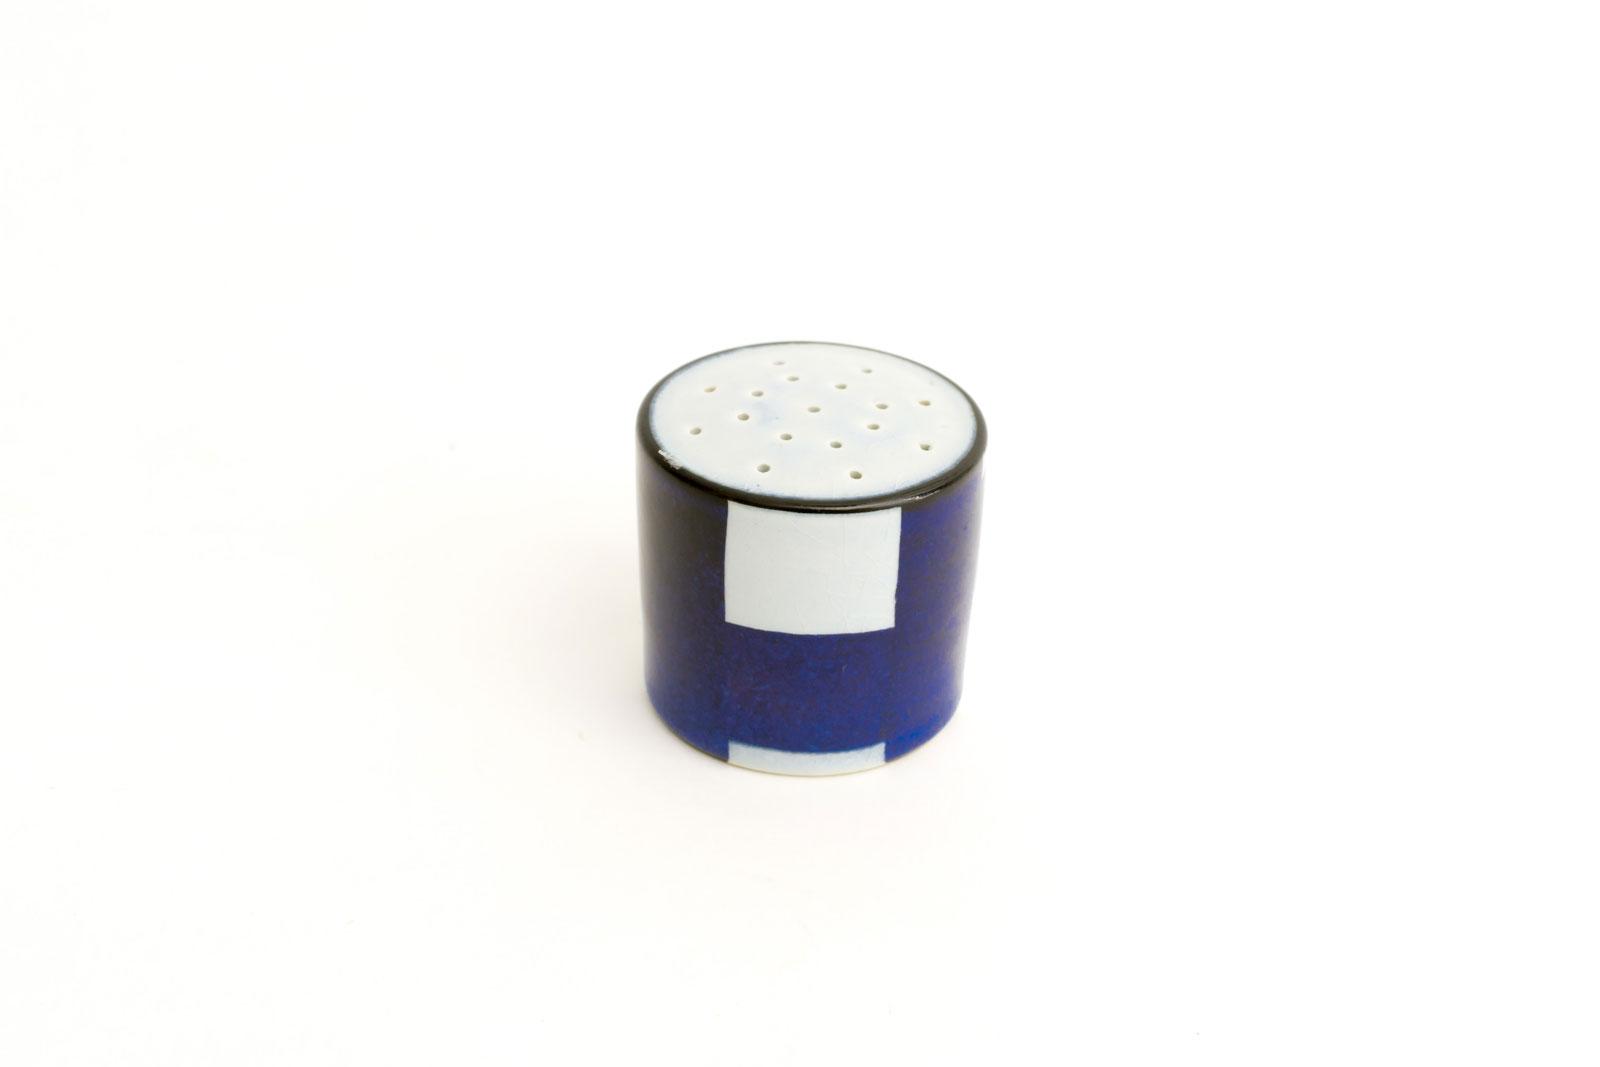 Solt Case designed by Inge-lise Koefoed